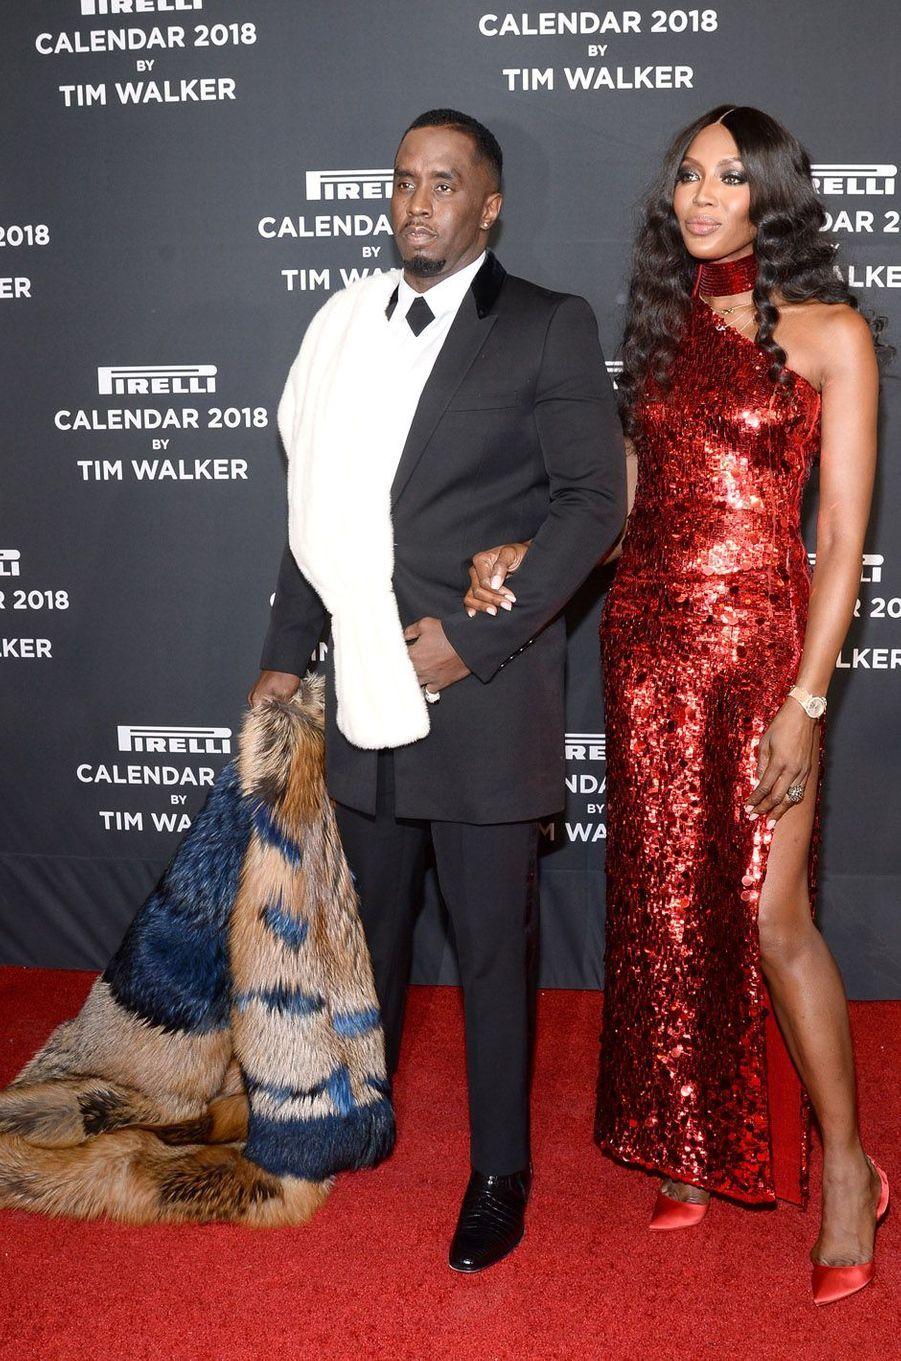 Naomi Campbell et Diddy au gala Pirelli, le 10 novembre 2017 à New York.